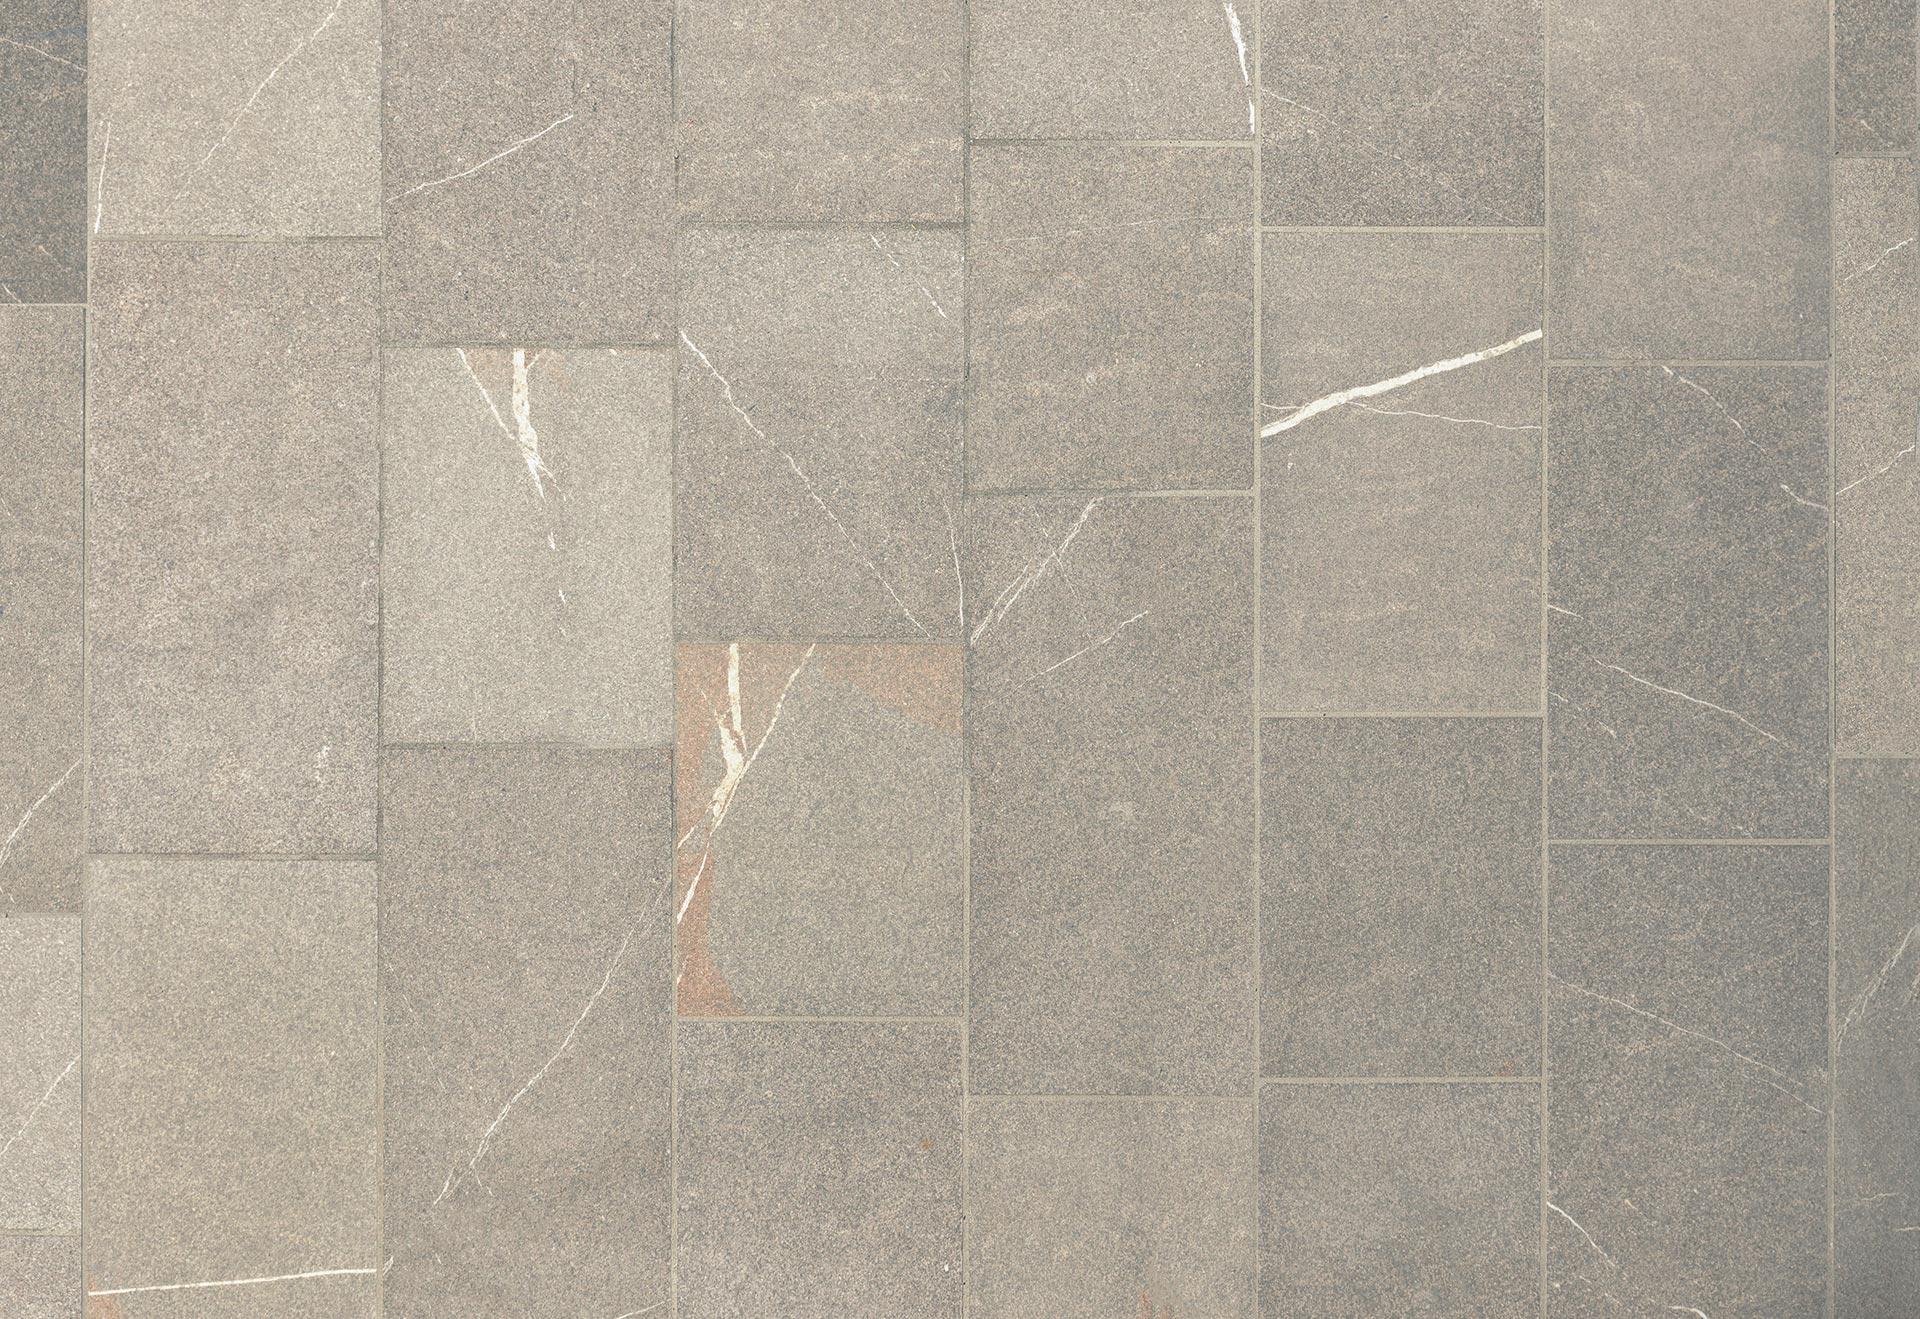 gaverini | le nostre pietre: Pietra Piasentina